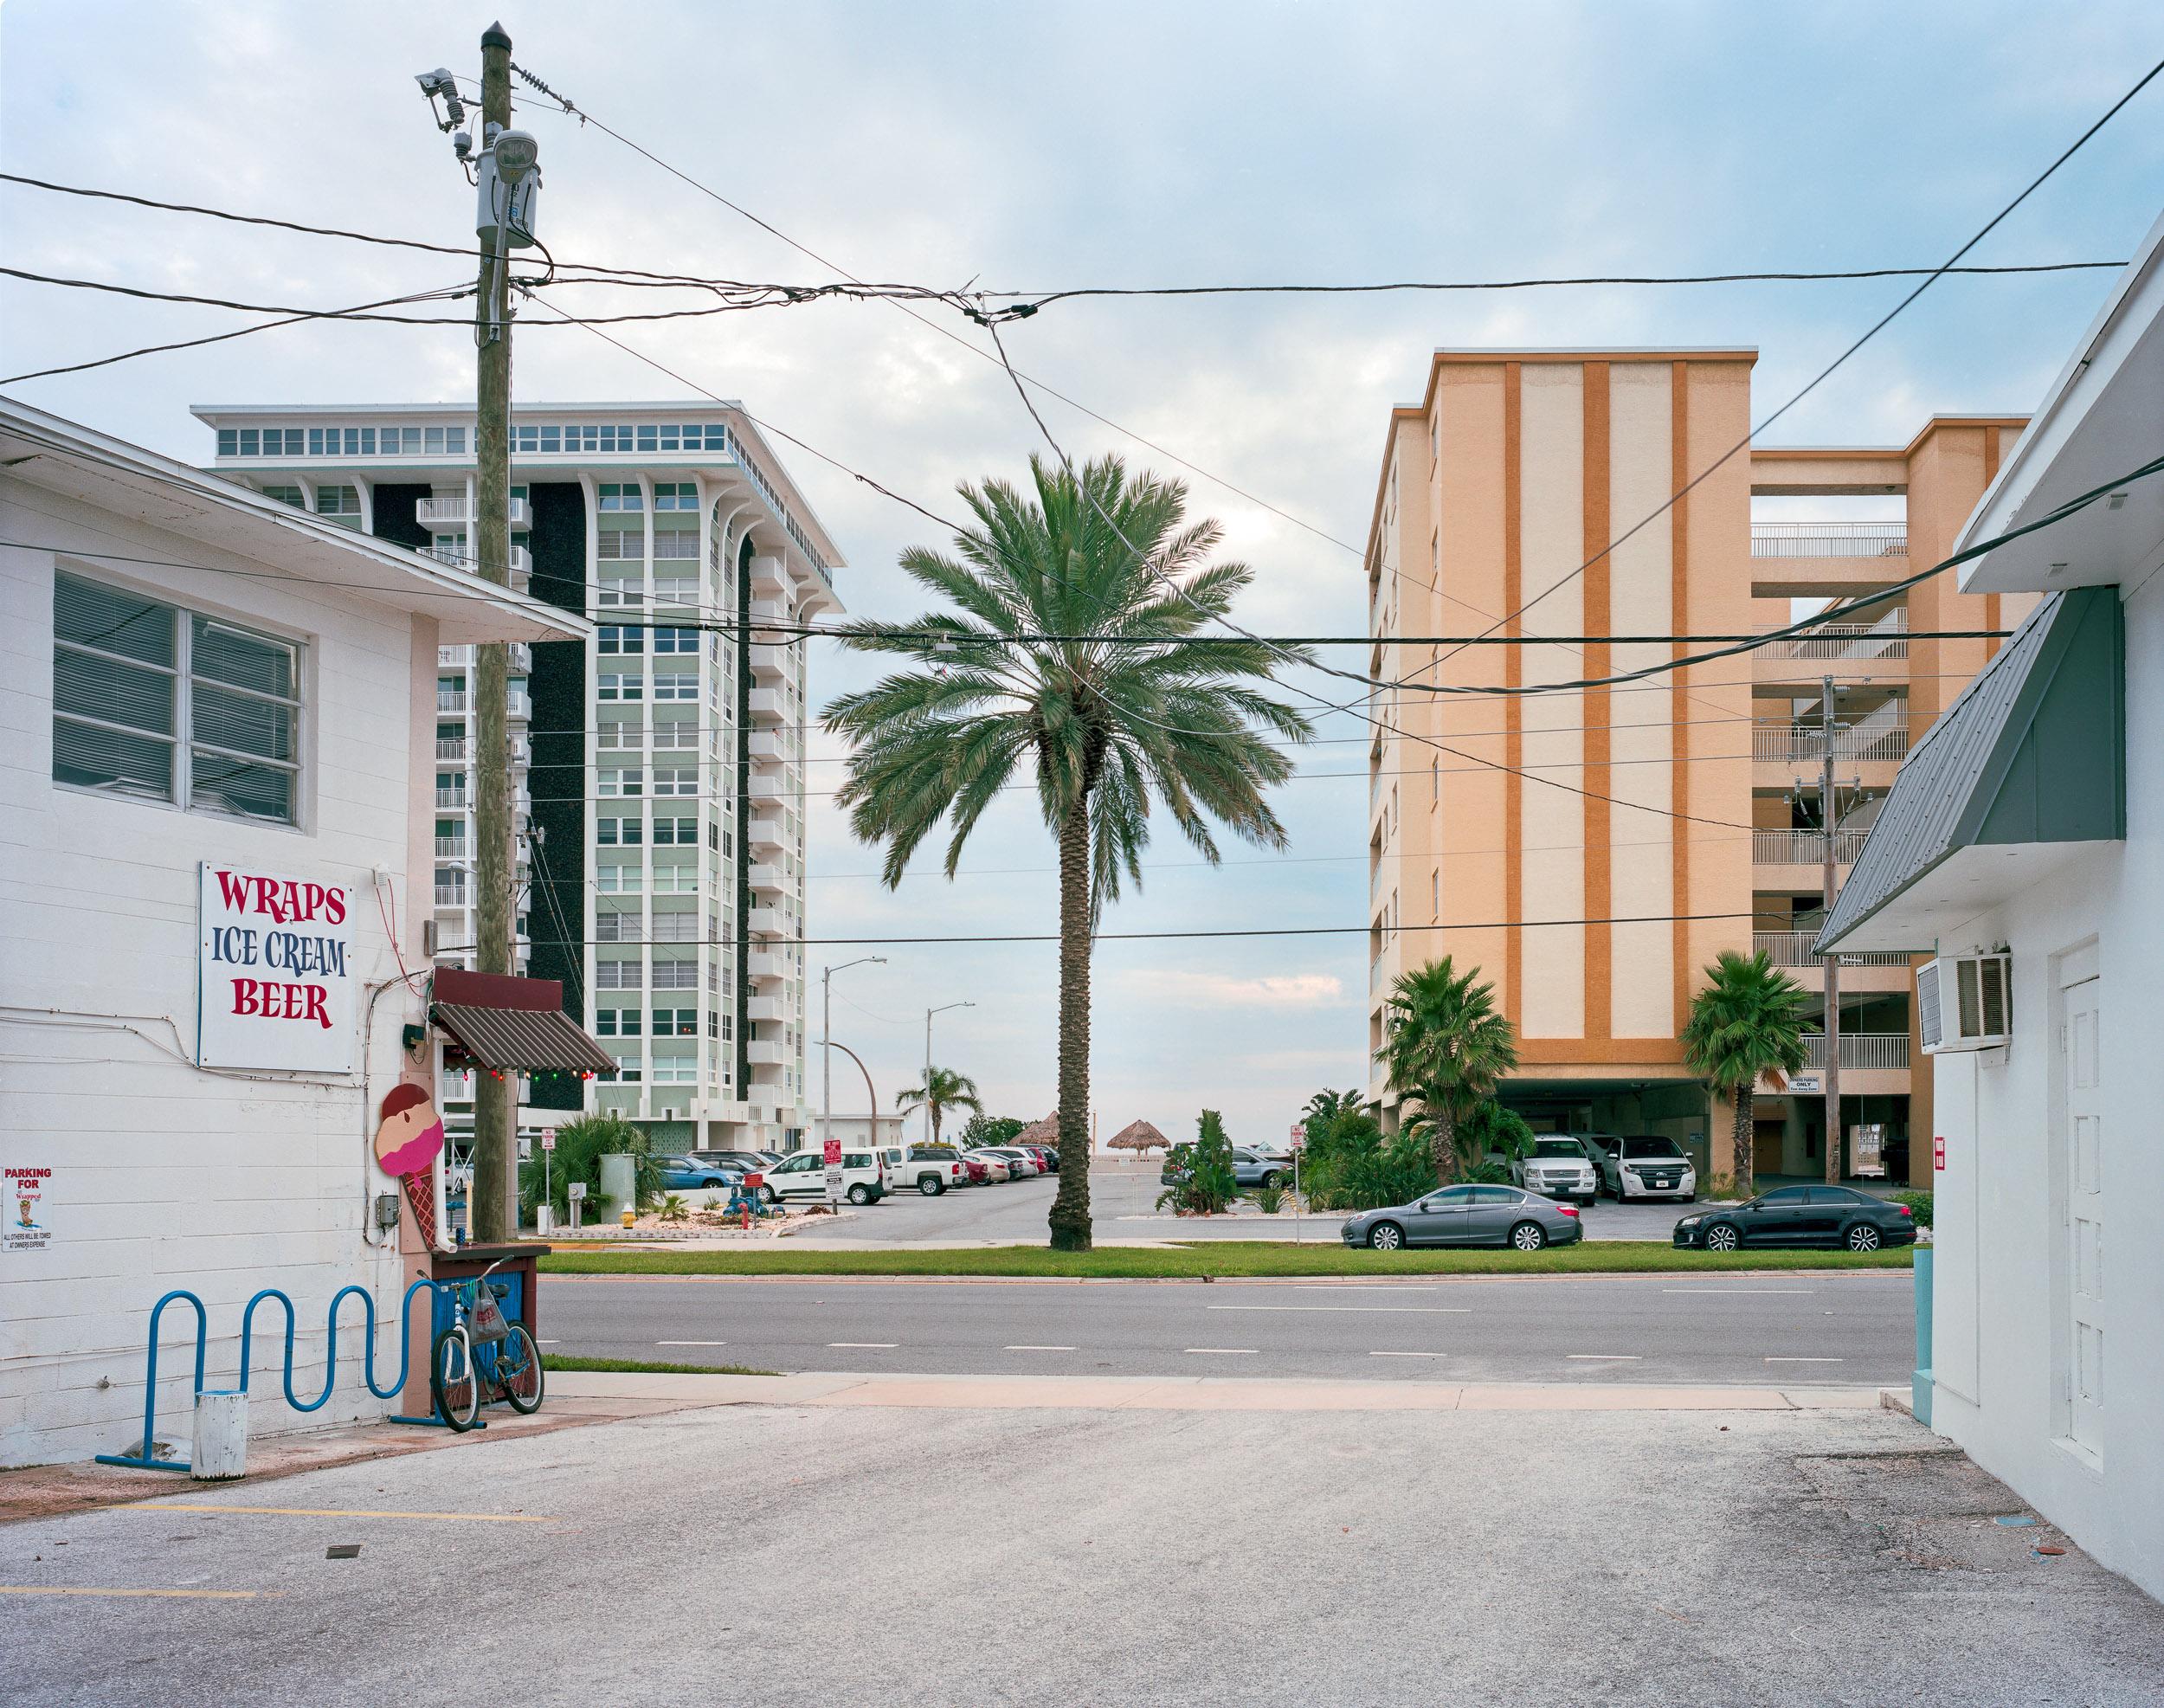 Highway Arbor, Treasure Island, Florida